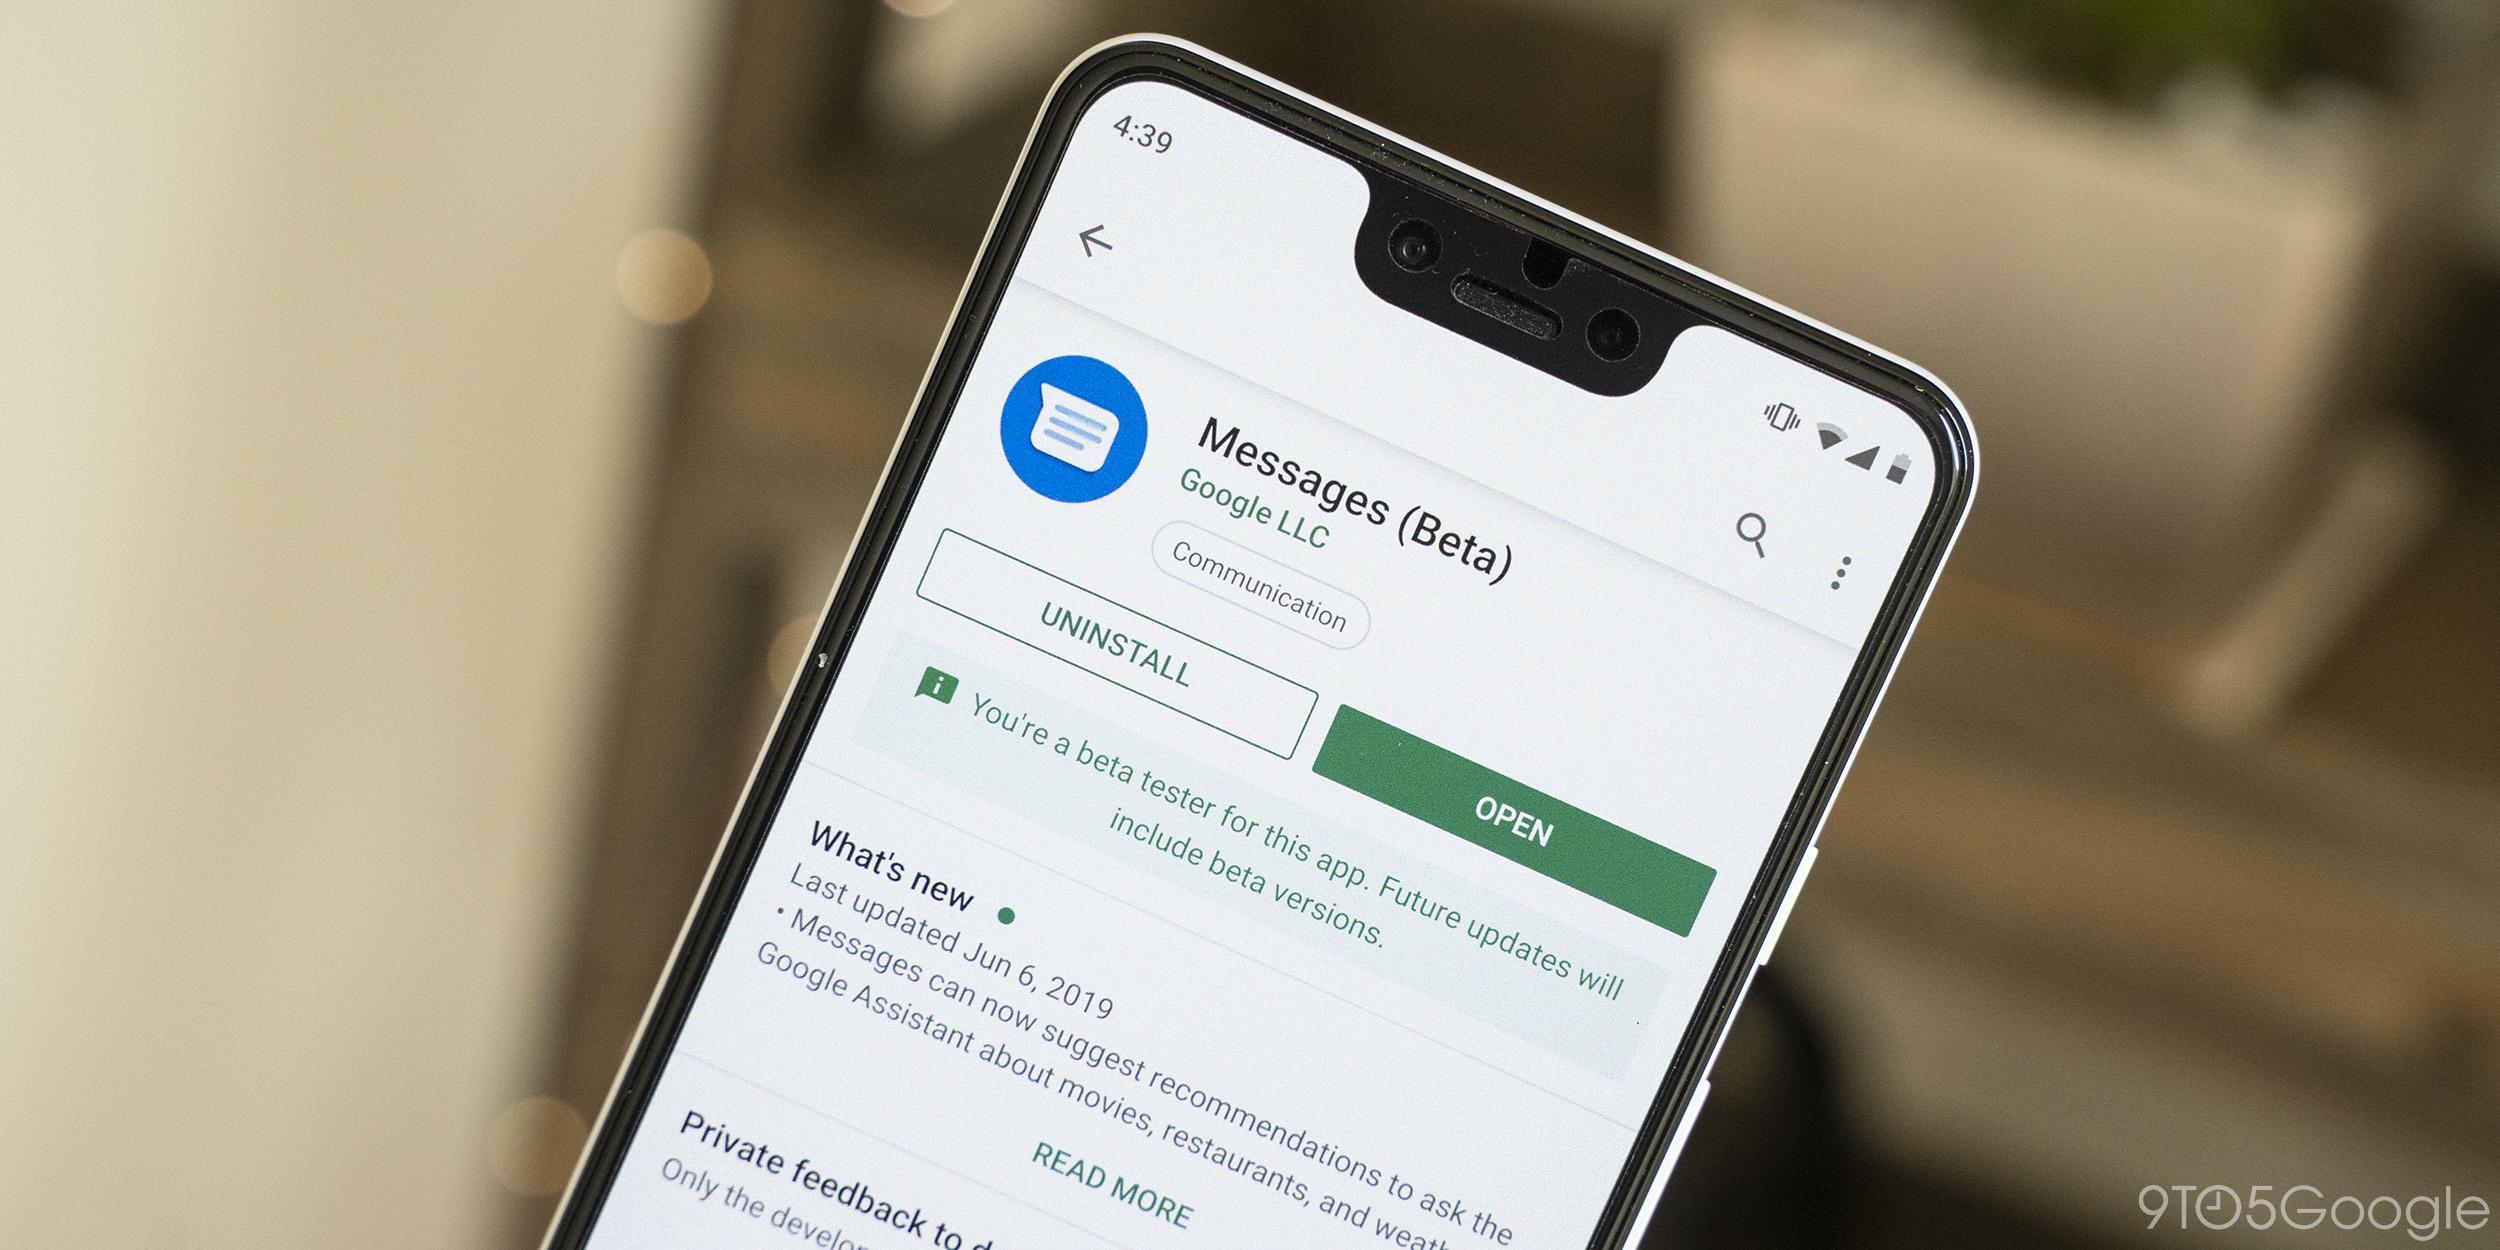 [Update: Fixed] PSA: Google Messages Beta v4.7 crashes immediately on startup